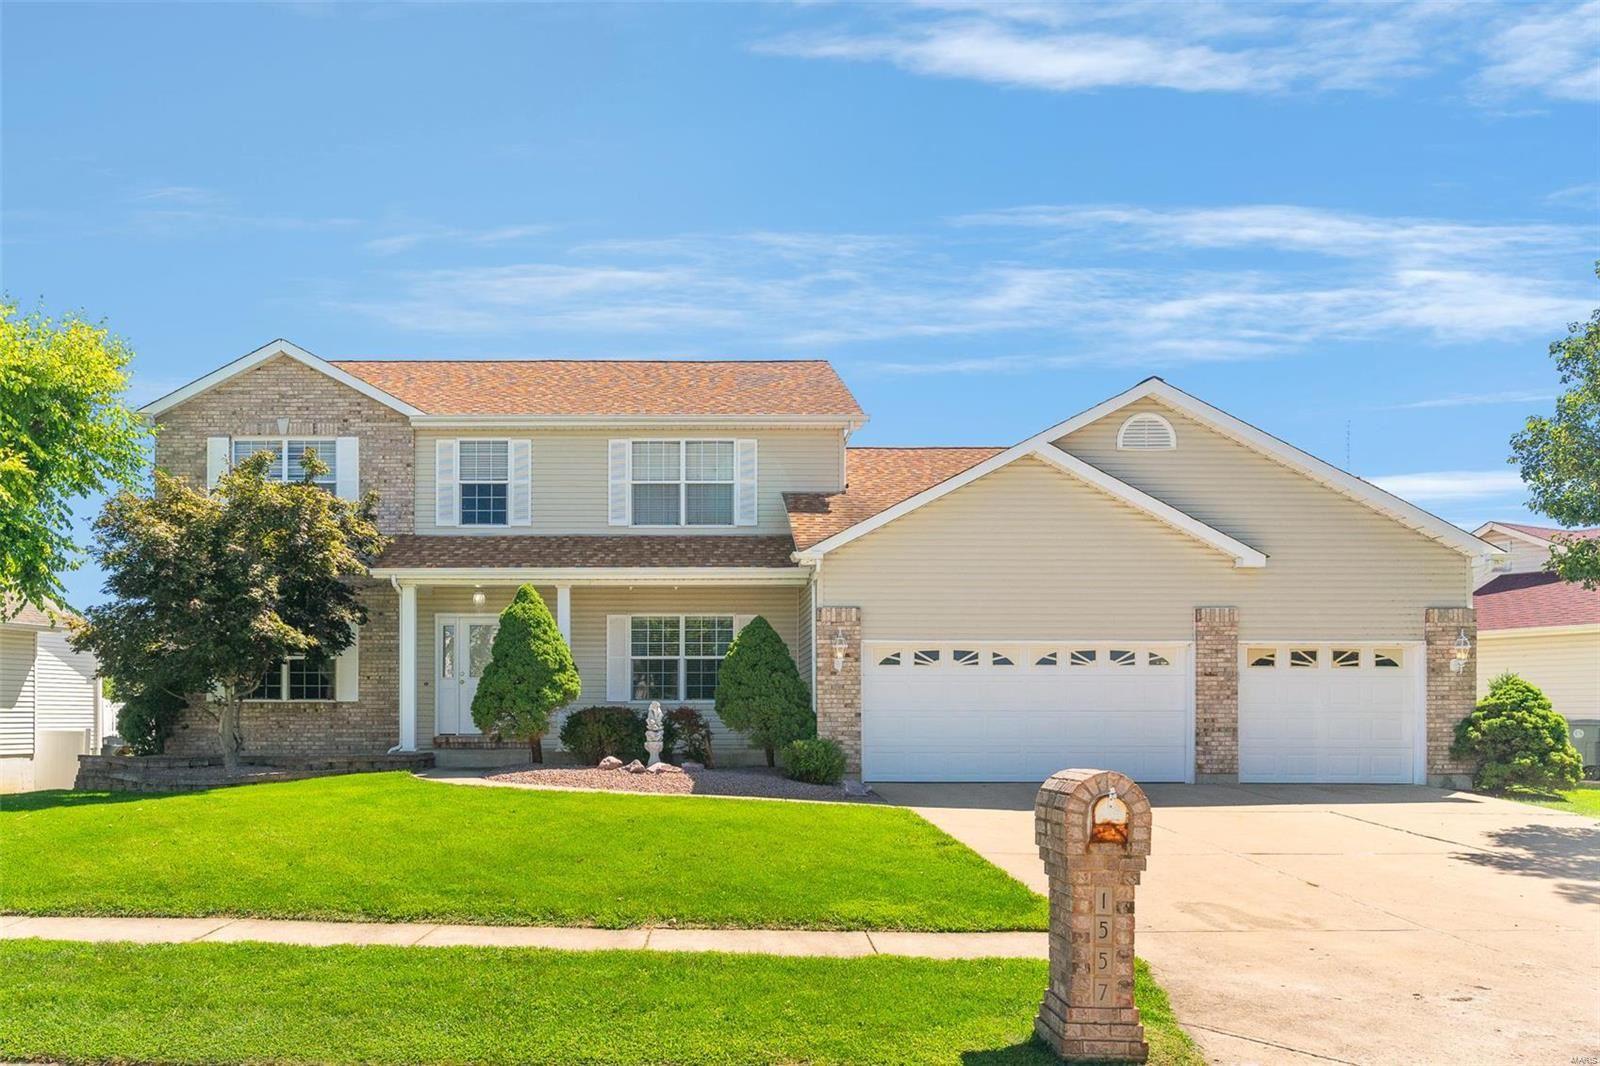 1557 Norwood Hills Drive, OFallon, MO 63366 - MLS#: 20052977